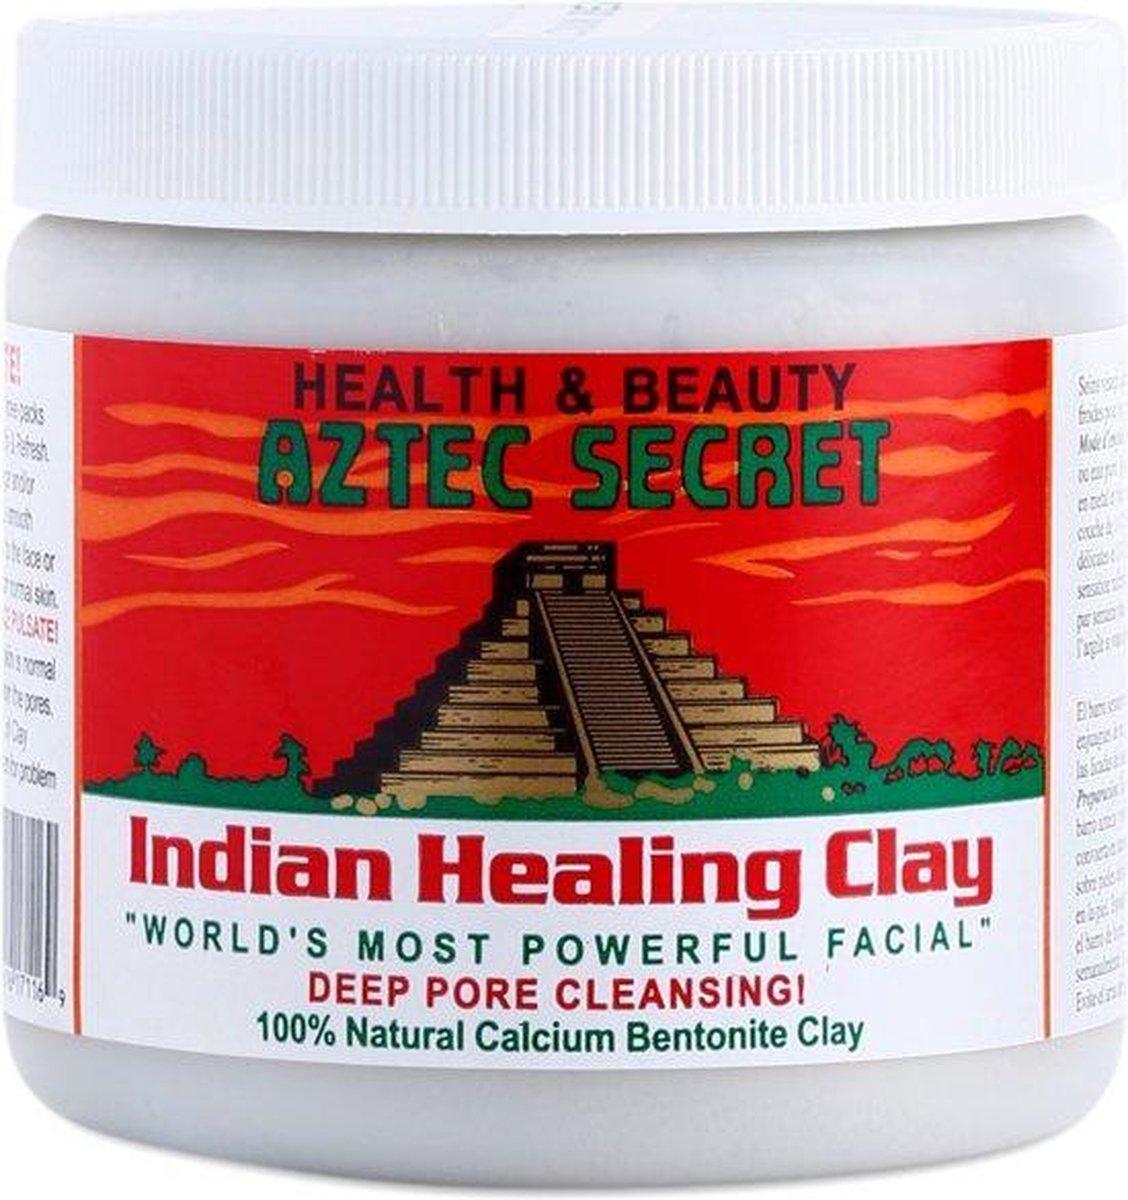 Aztec Secret Indian Healing Clay - 450 g